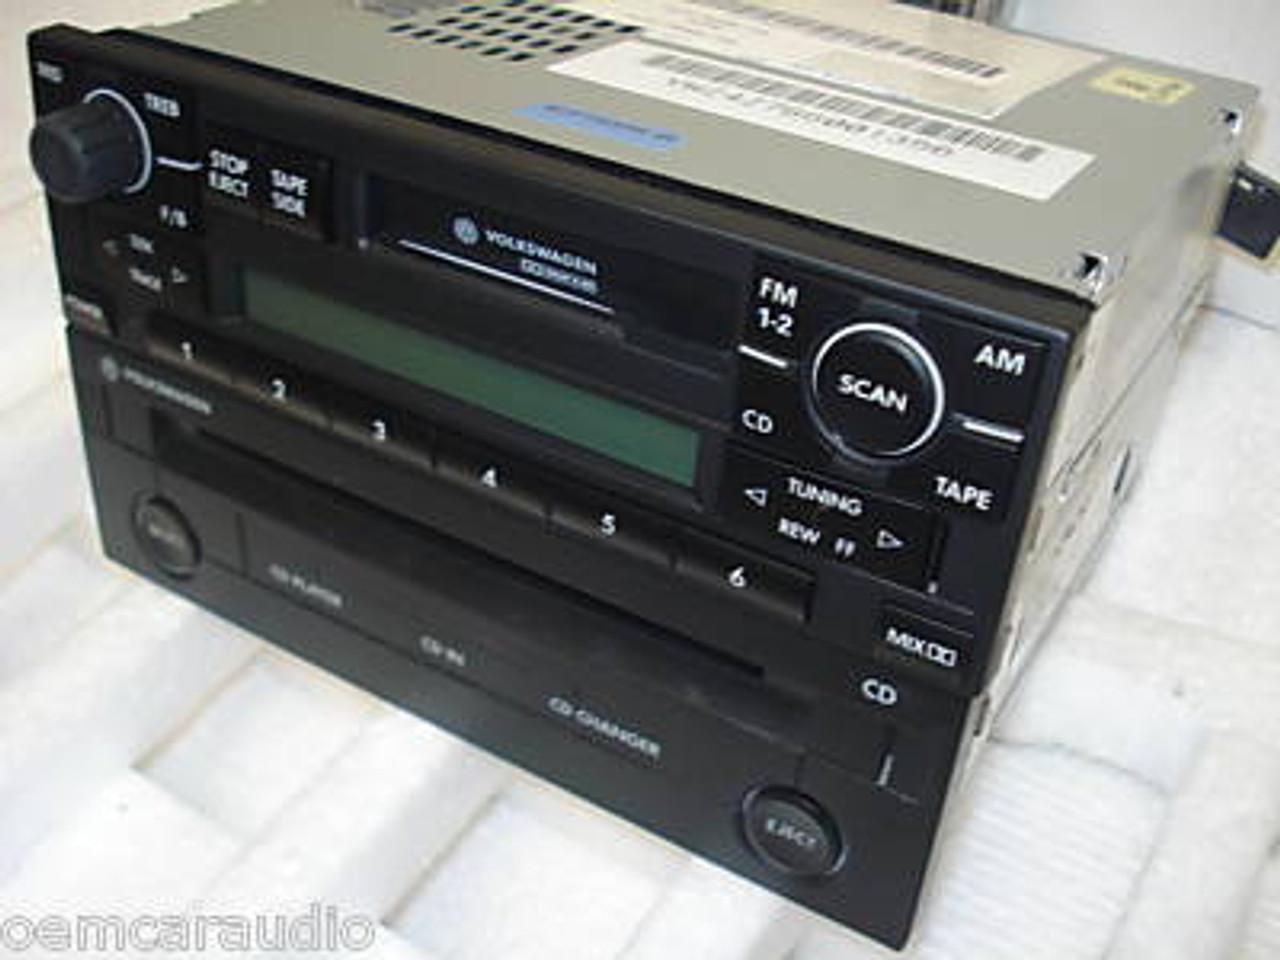 VW VOLKSWAGEN Passat Jetta Golf GTI Eurovan Cabrio AM FM Radio Stereo Car  Audio CD Player 1998 1999 2000 2001 2002 1J0 035 119 BX, 1J0 035 180 AX